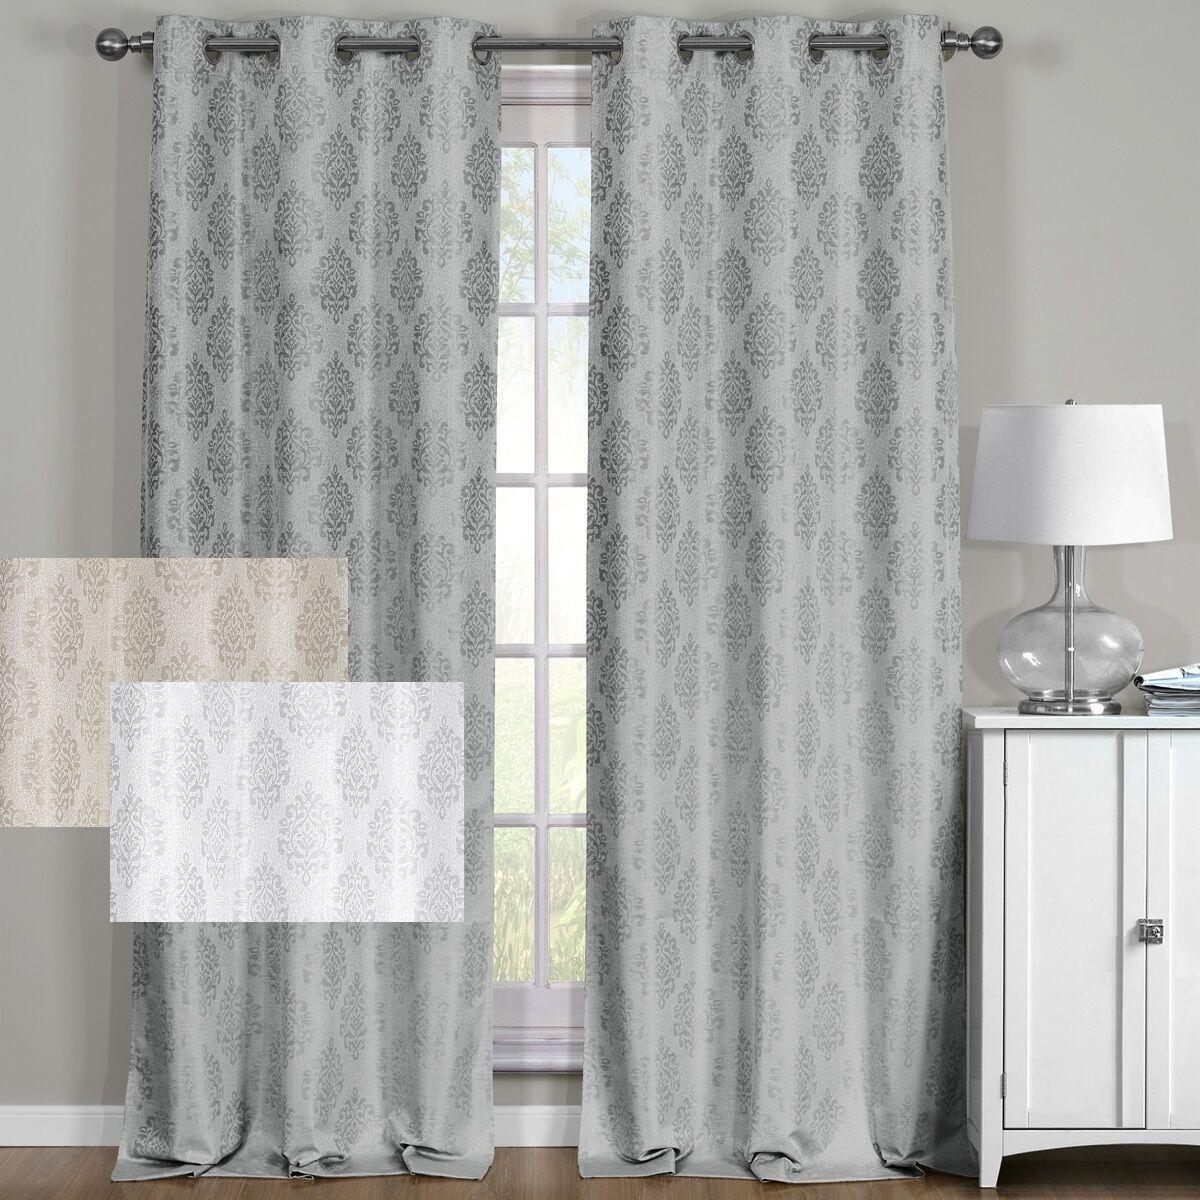 Paisley 100% Blackout Window Curtain Panels Heat and Full Li